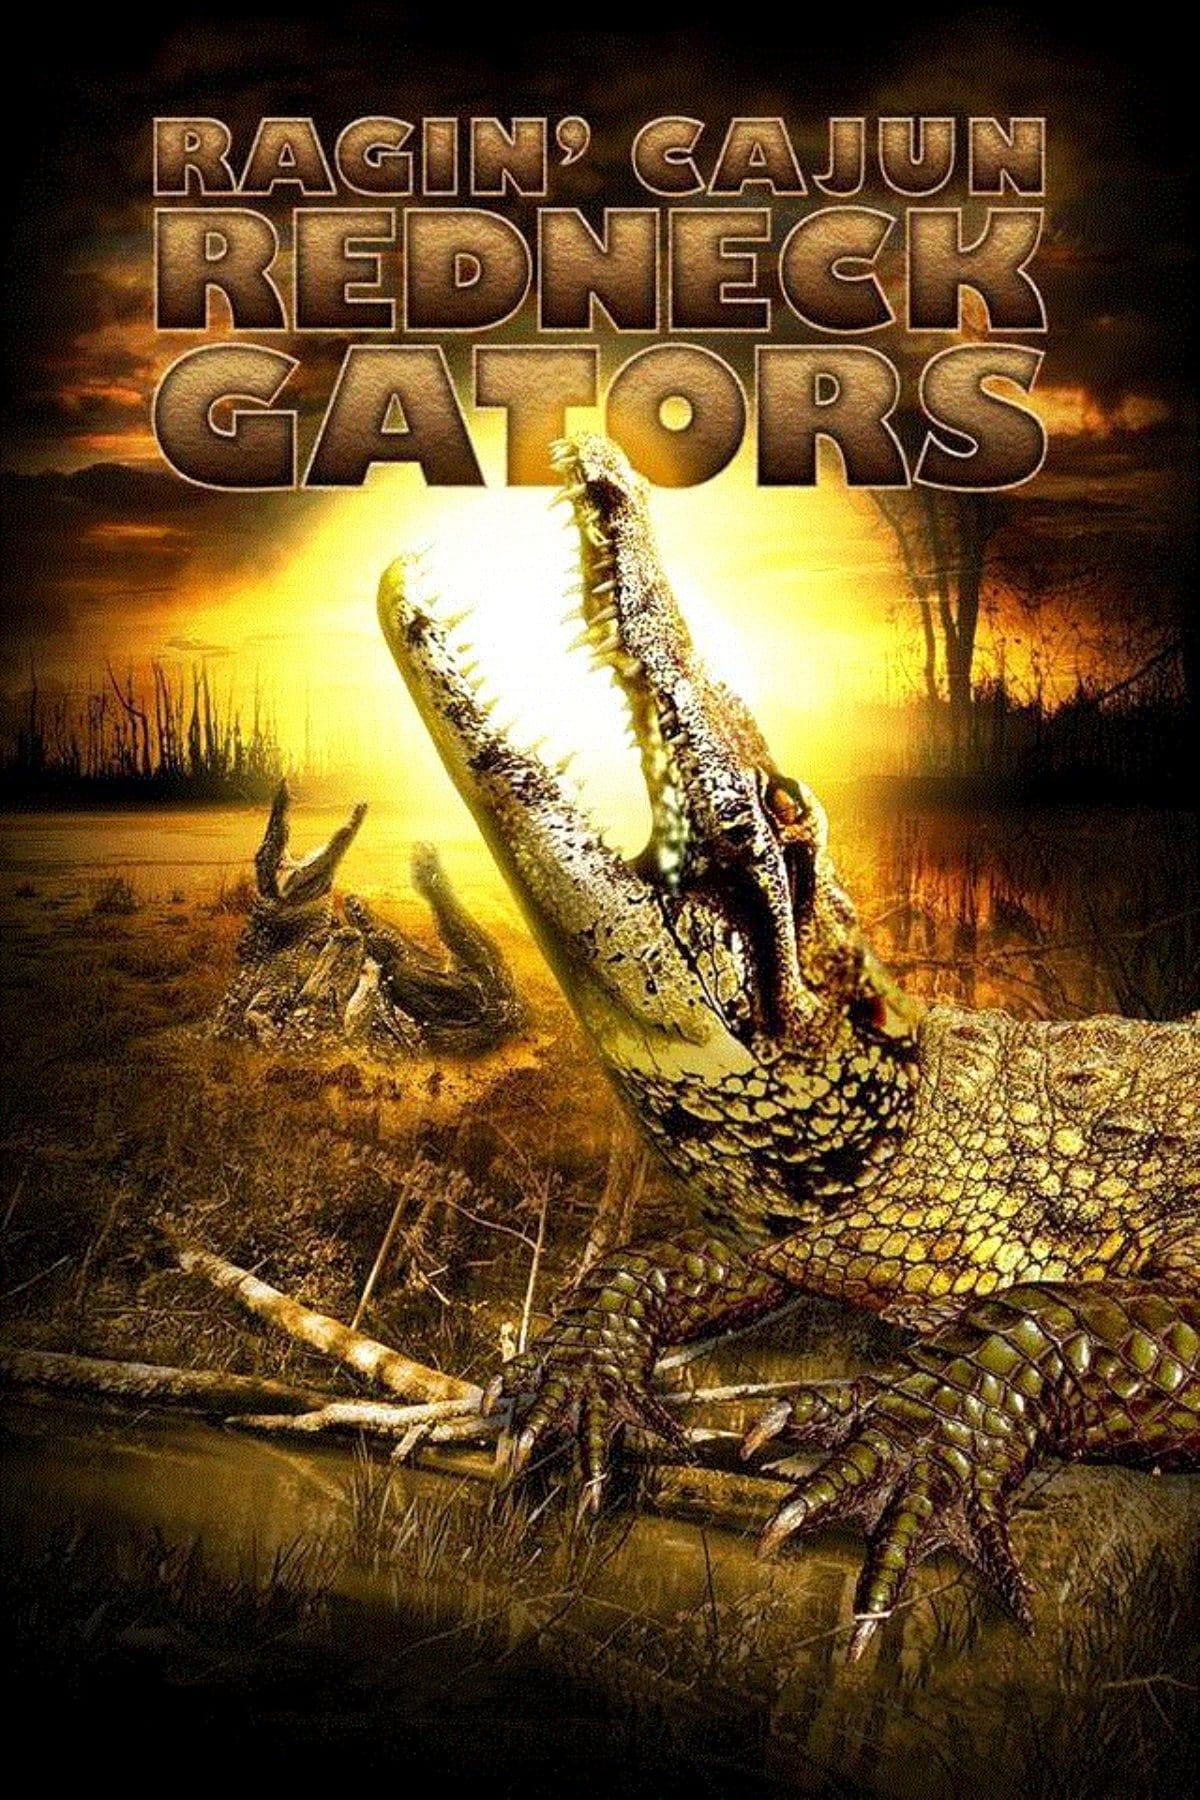 Ragin Cajun Redneck Gators